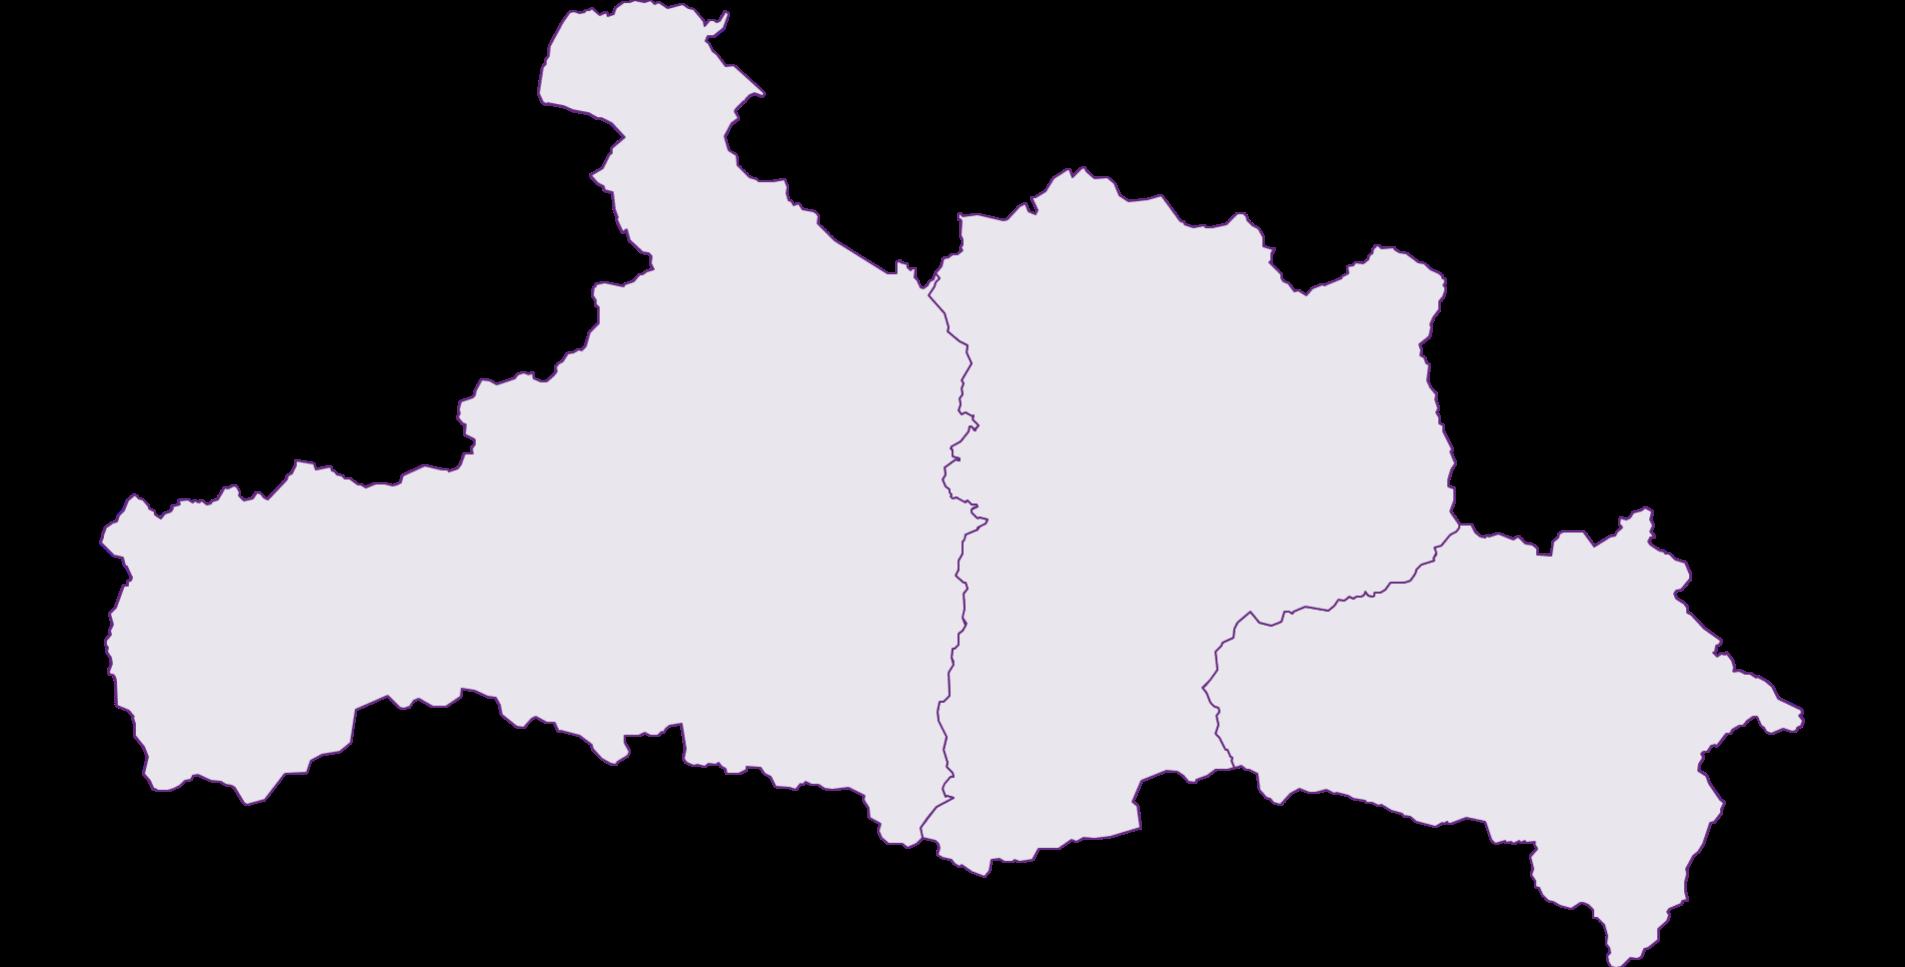 Lungau/Pinzgau/Pongau - Region - Austria - Geography, business and economics, statistics | Similio